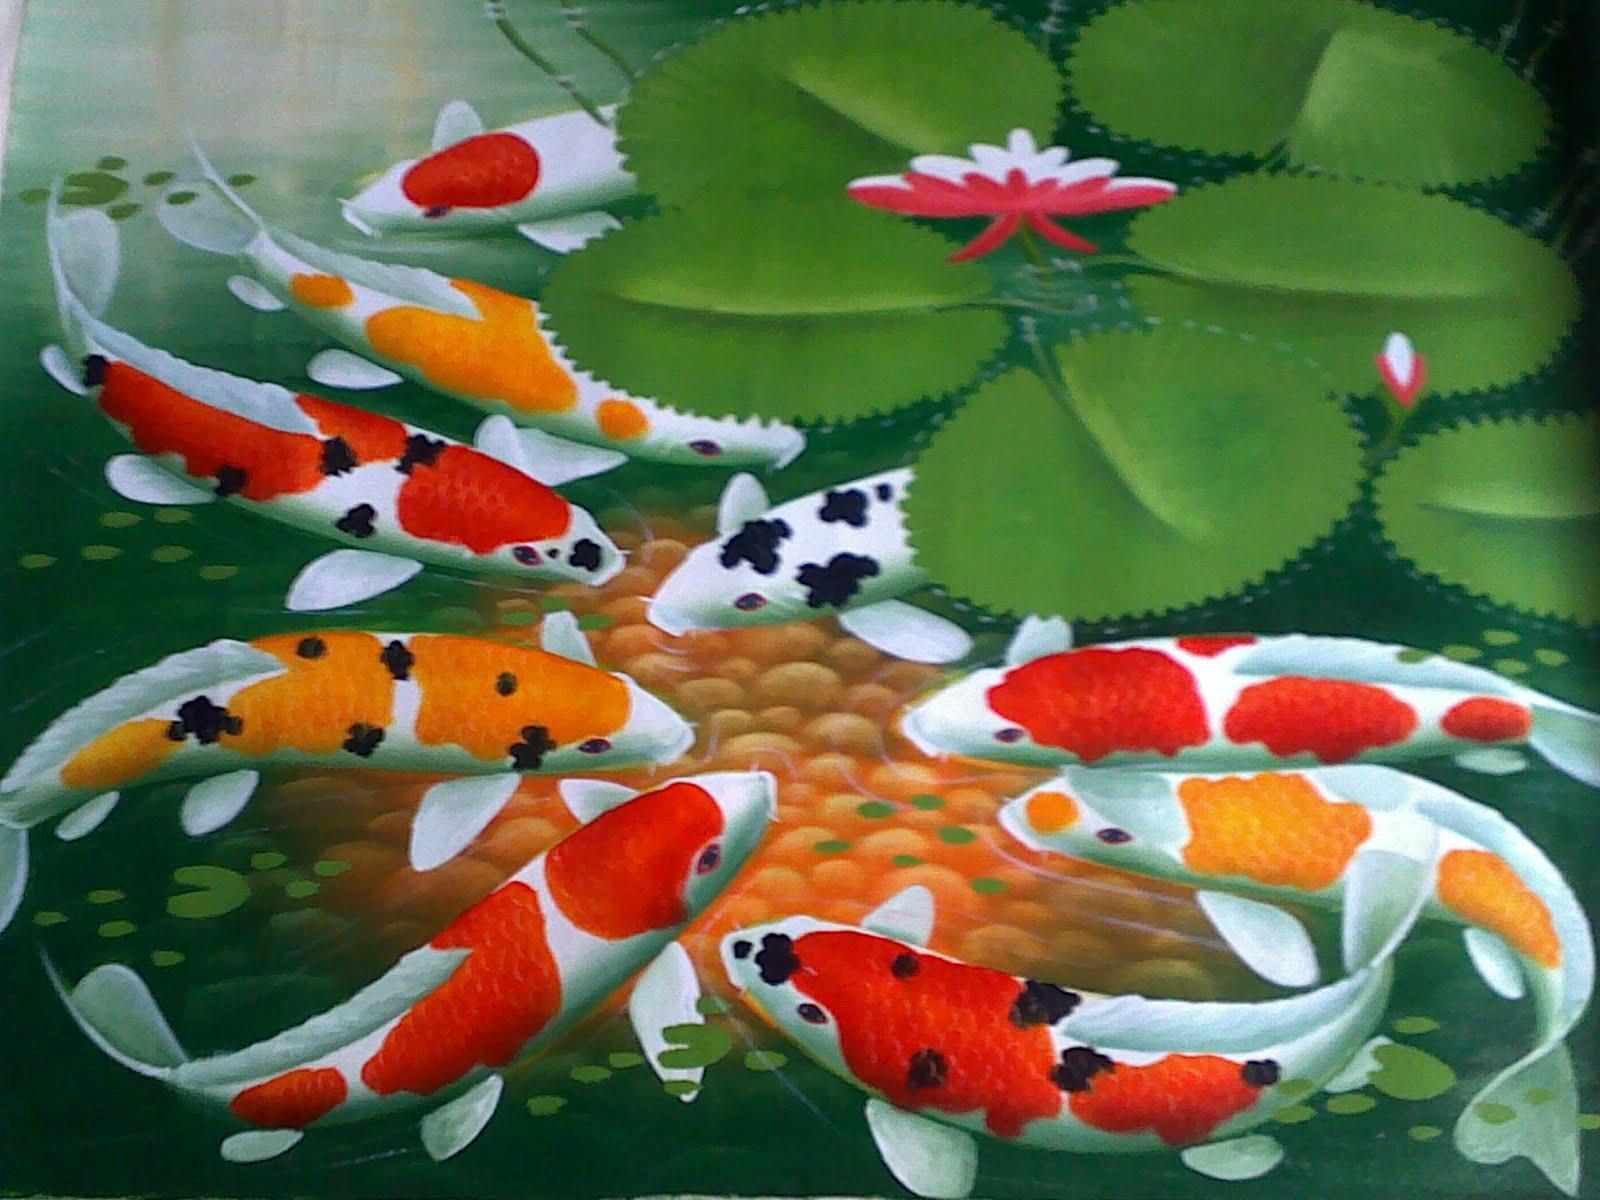 Belajar Desain Grafis Contoh Proposal Usaha Ikan Koi